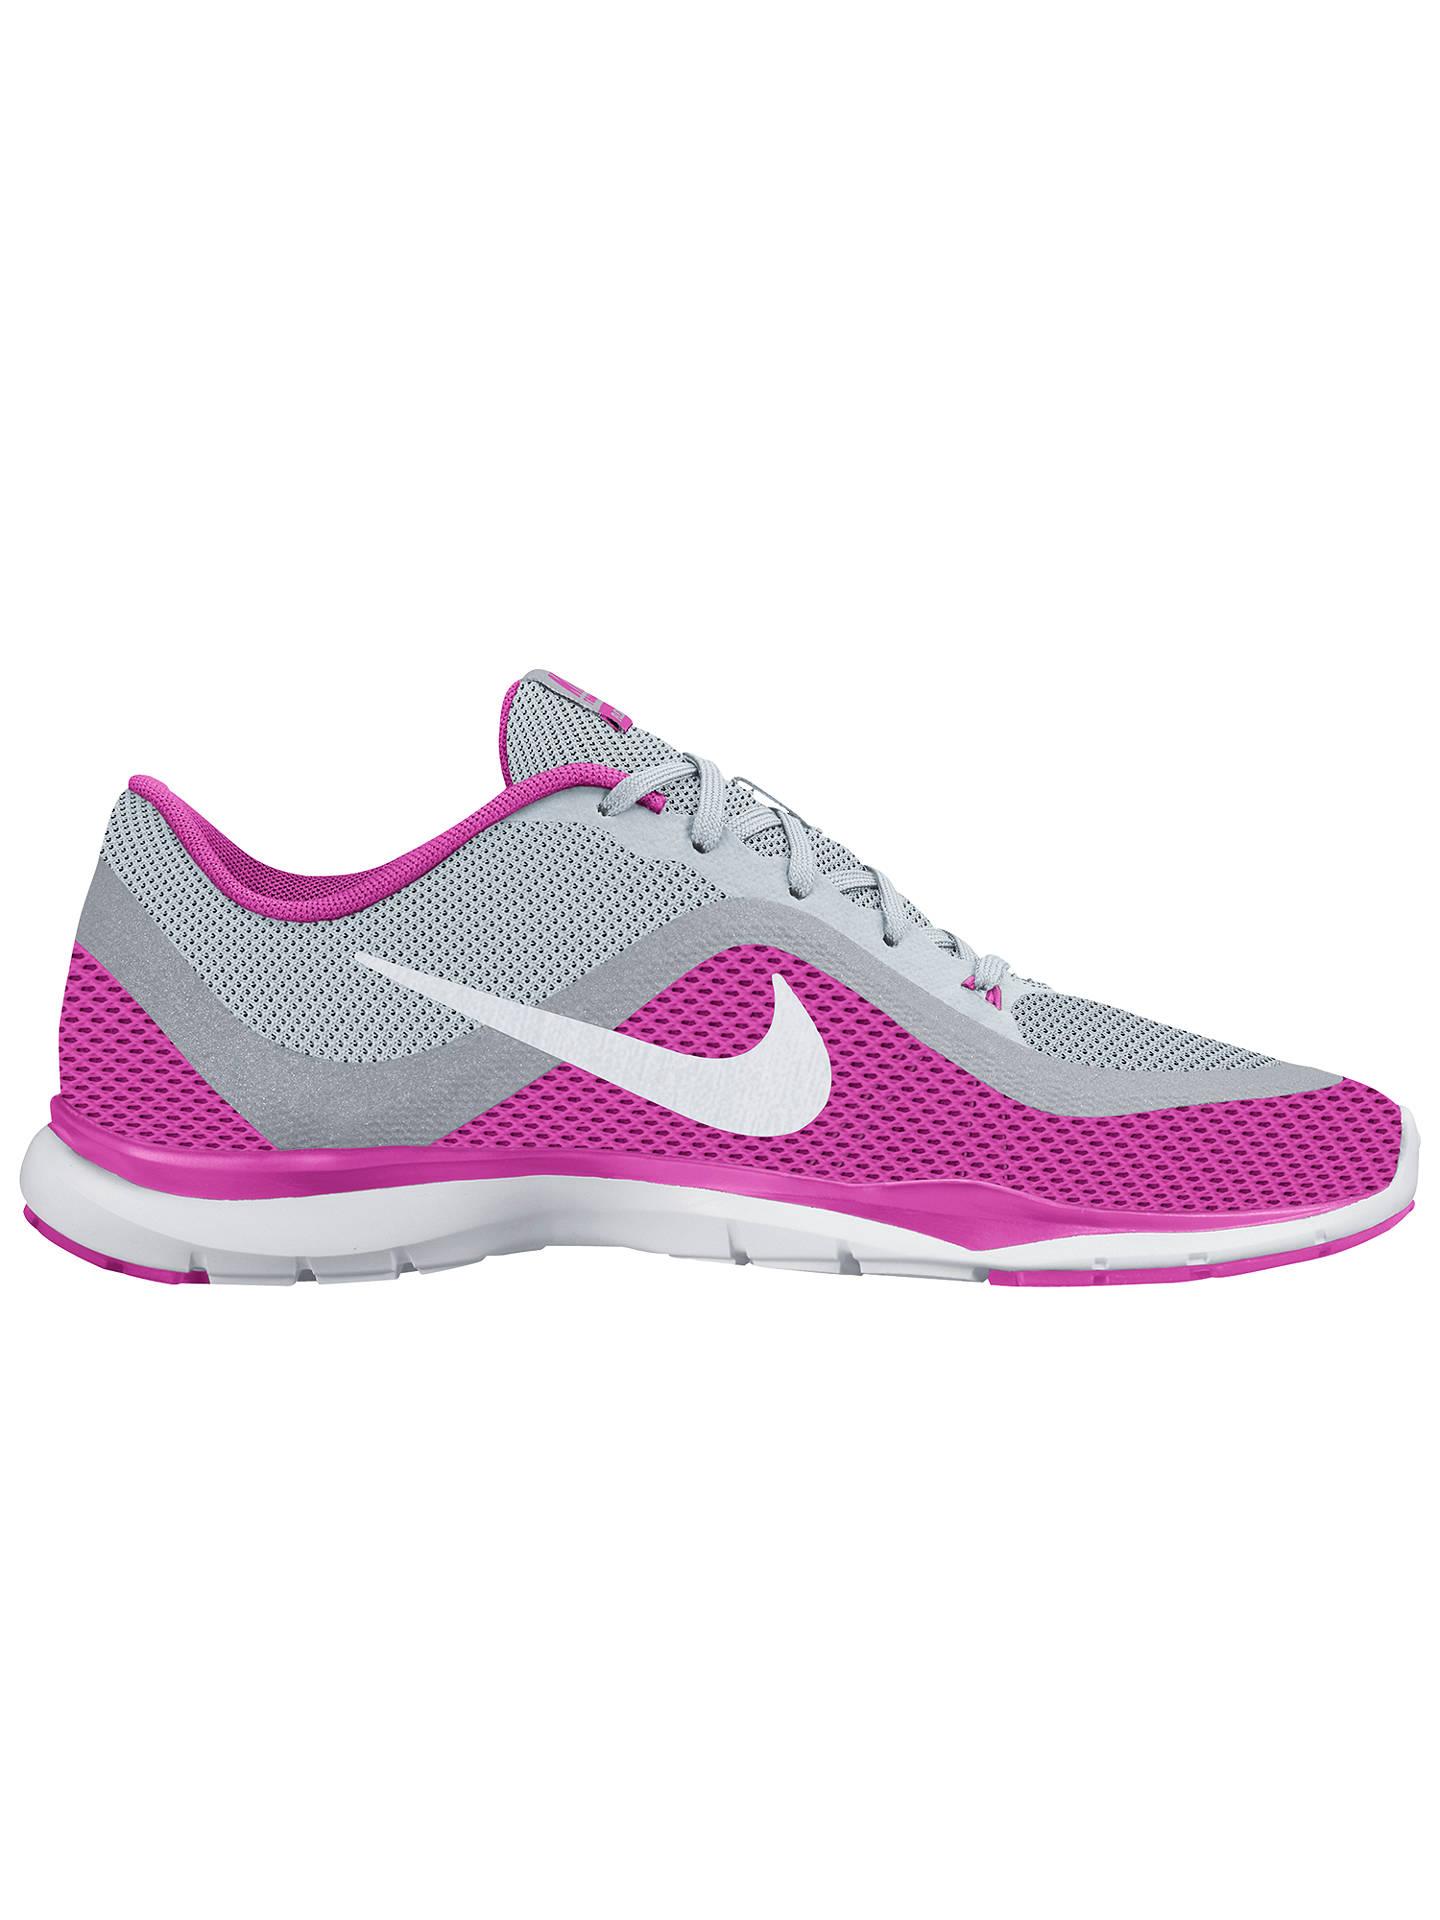 1b1991070835 Nike Flex Trainer 6 Women s Cross Trainers at John Lewis   Partners